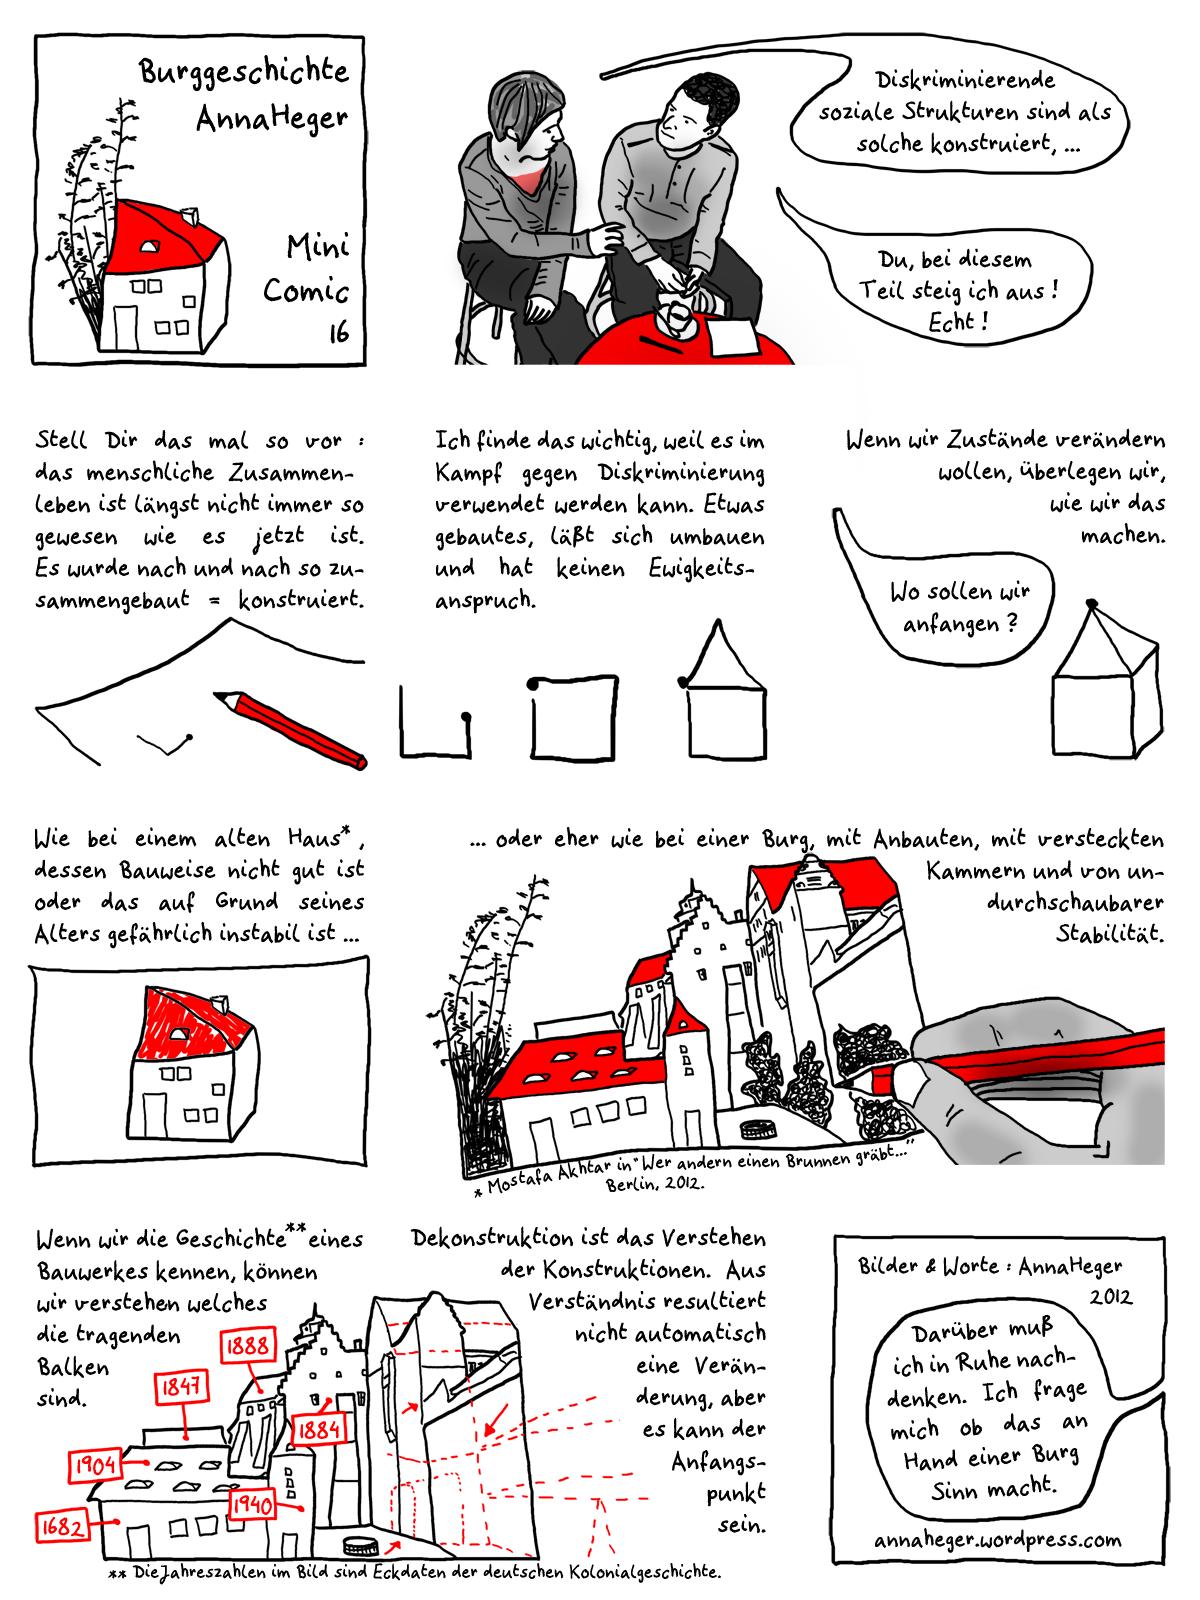 visuelles Minicomic 16 , das ganze Comic wird im folgenden in reinen Text transkribiert